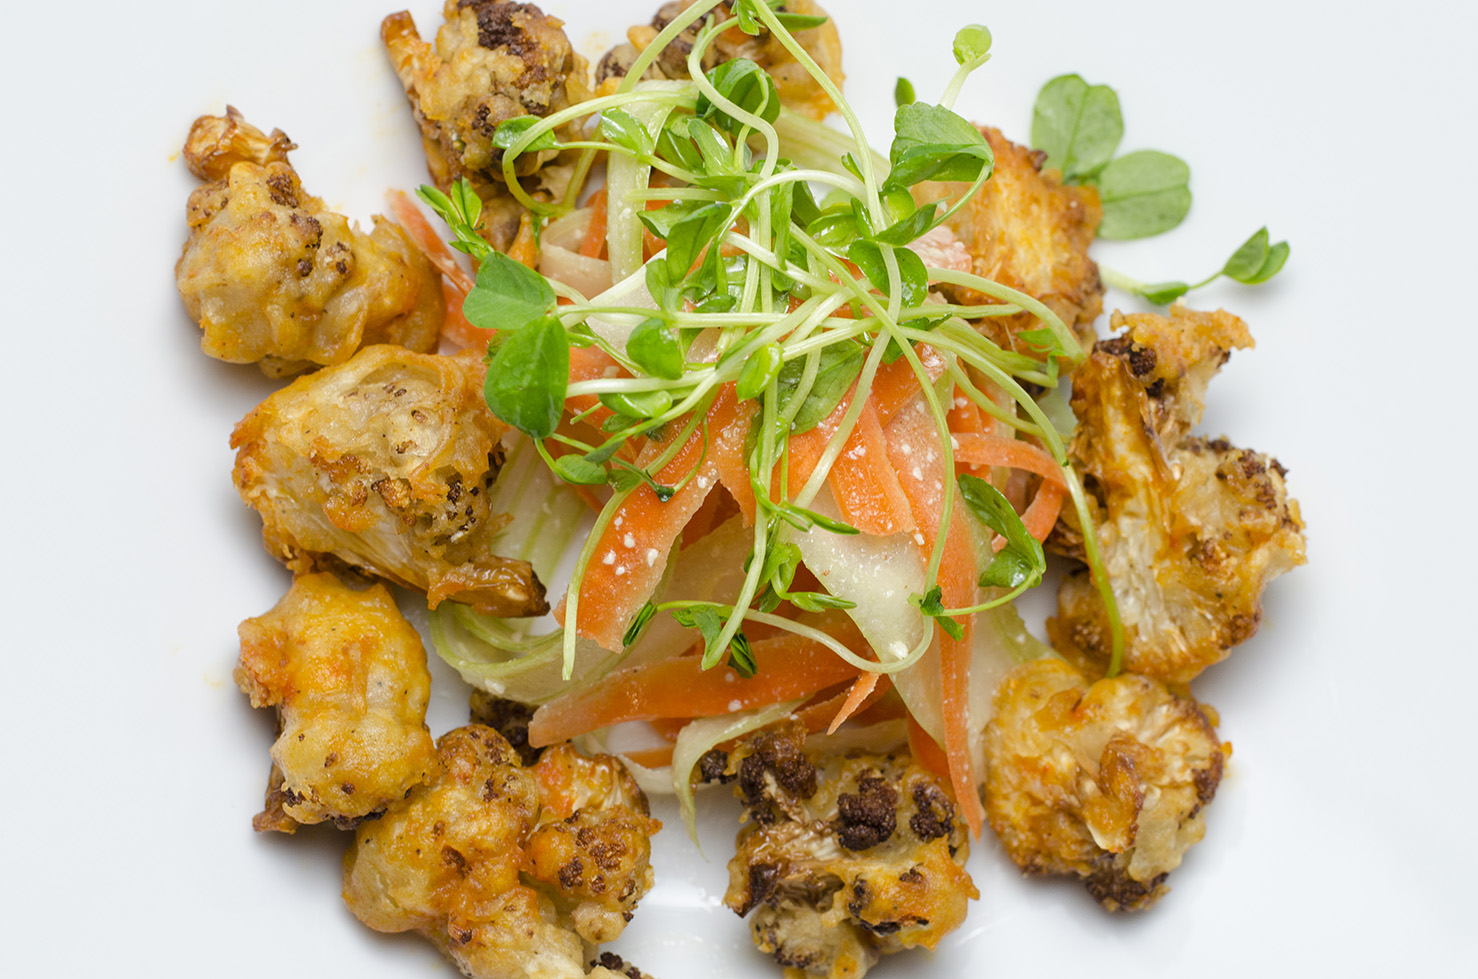 Buffalo Cauliflower at Thyme Kitchen.